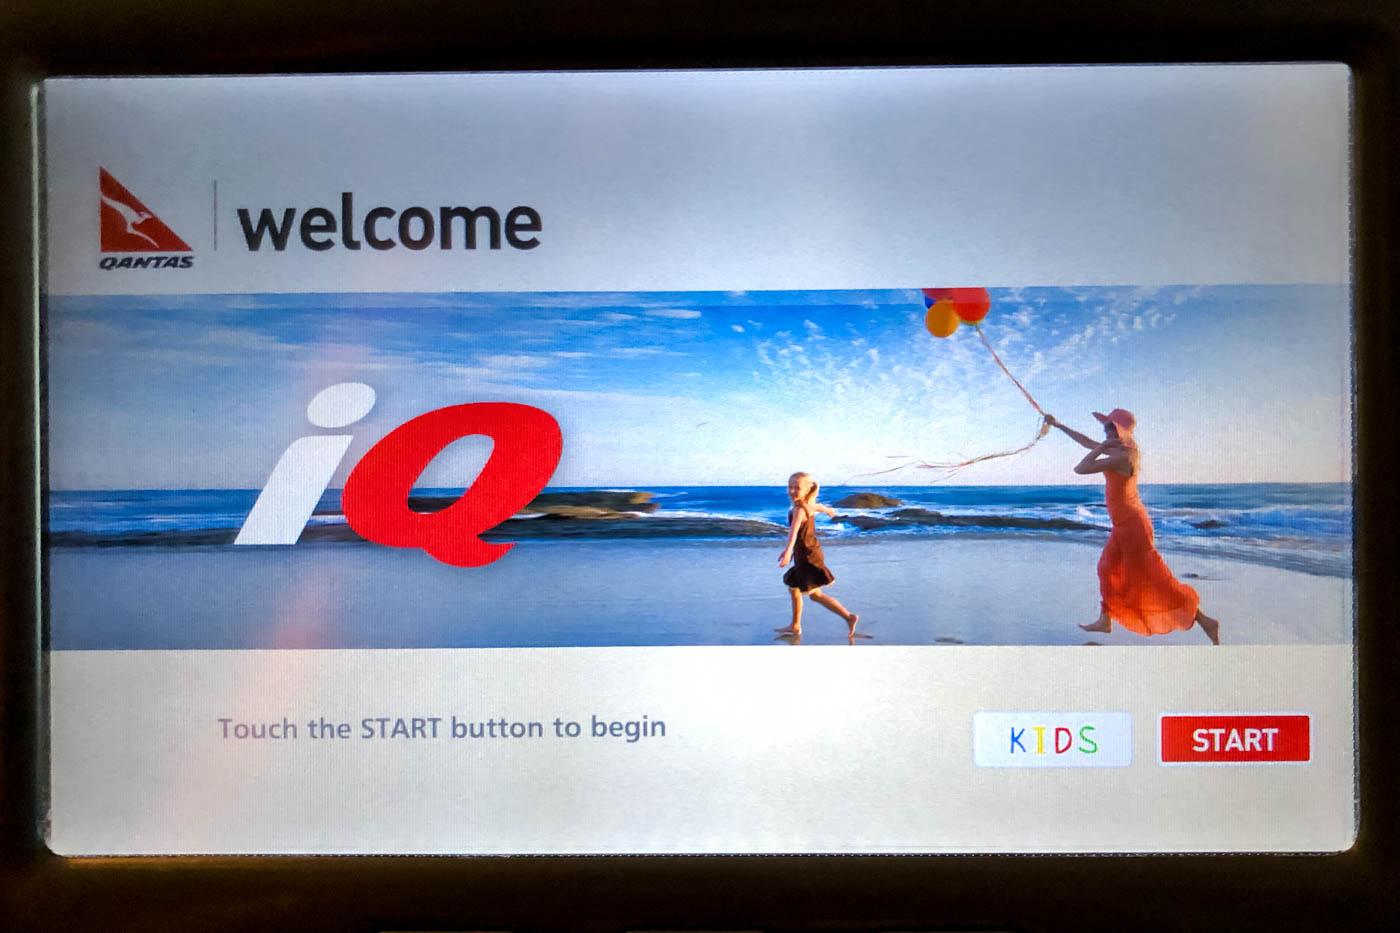 iQ Qantas In-Flight Entertainment System